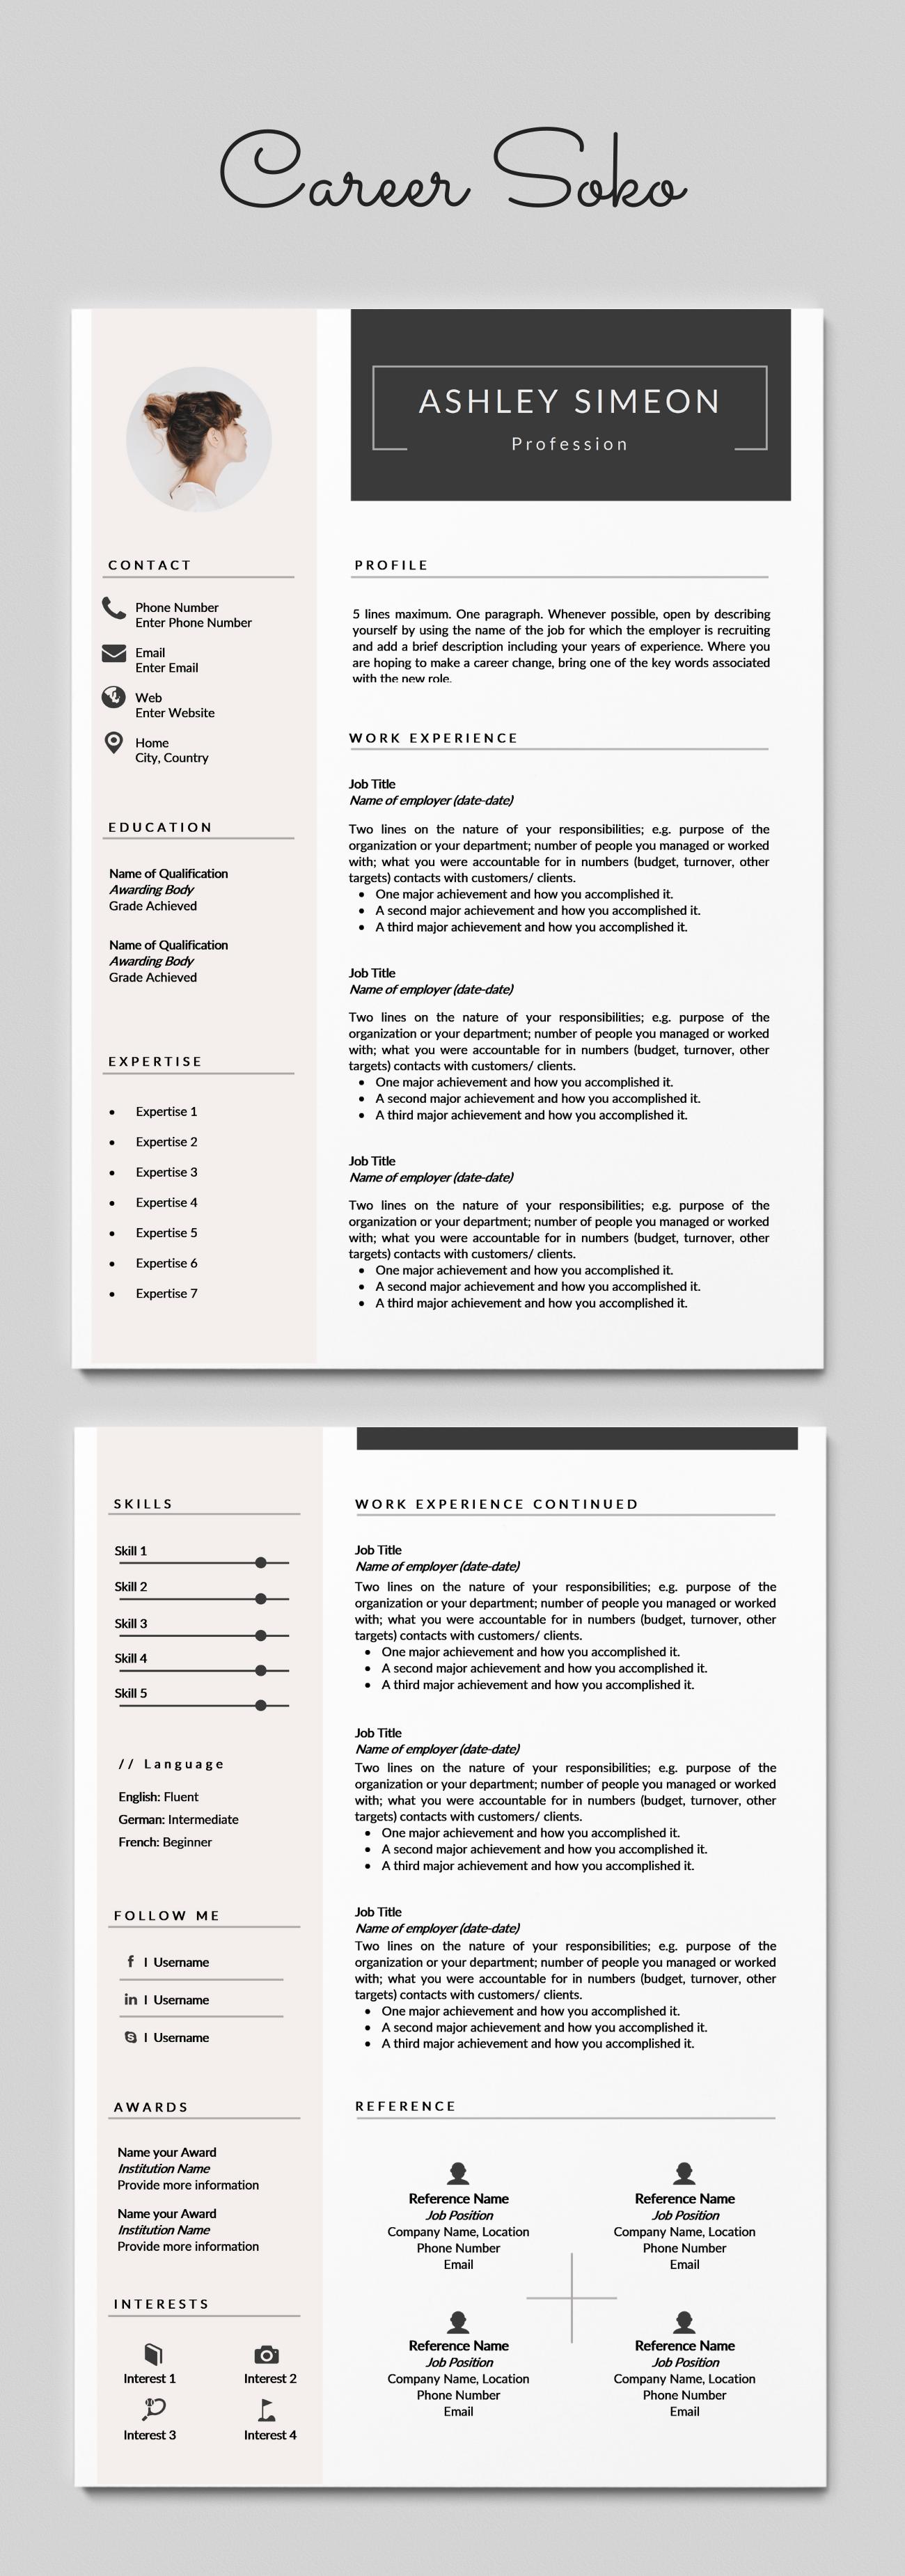 Minimalist Resume 2 Page Resume Template Cv Template Curriculum Vitae Cv Design Resume Template Word Free Resume Template In 2020 Minimalist Resume Resume Design Architecture Resume